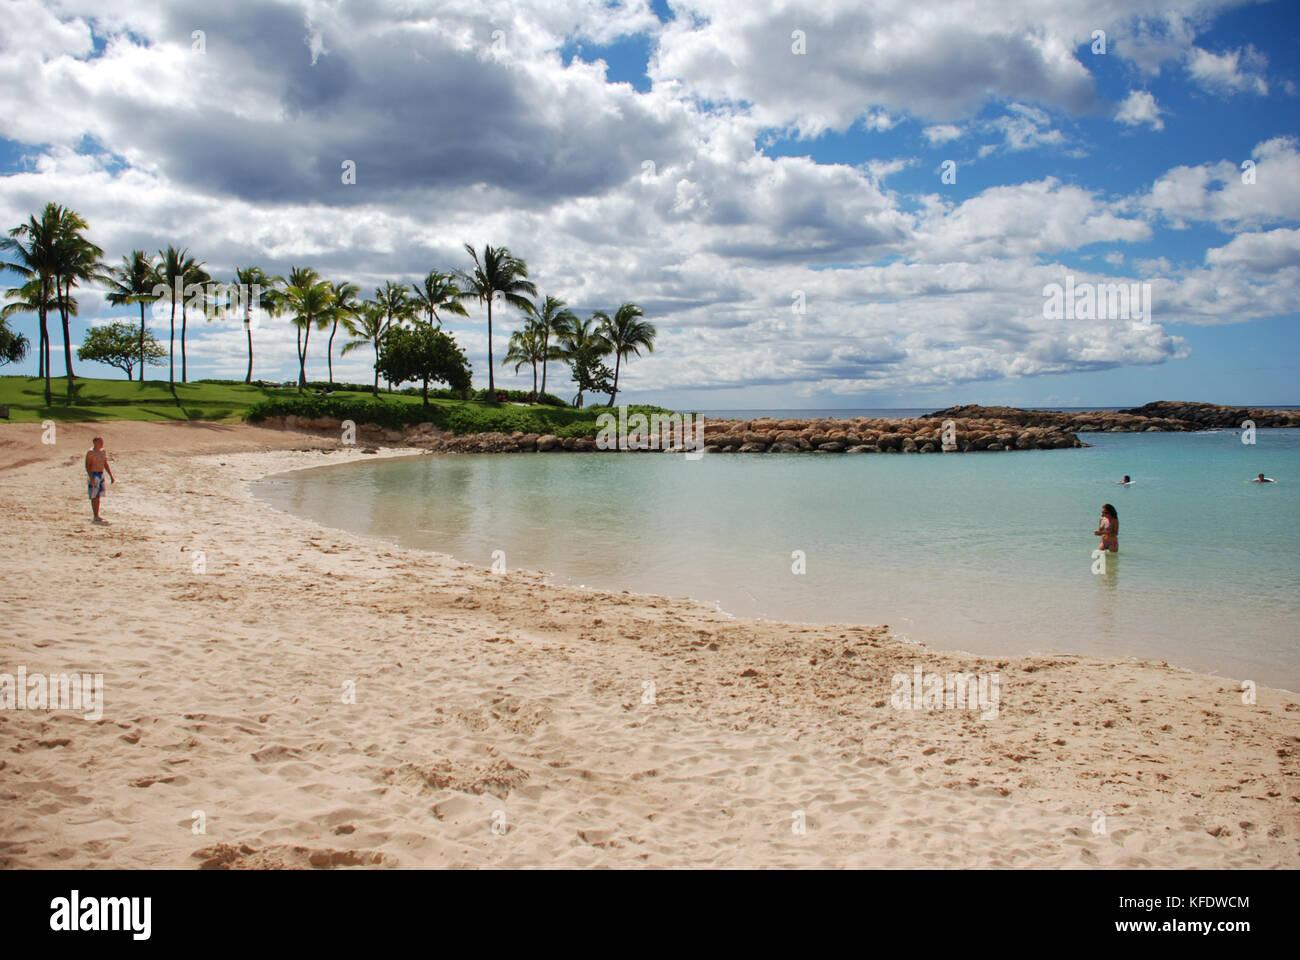 Ko Olina Resort - Oahu, Hawaii - Stock Image